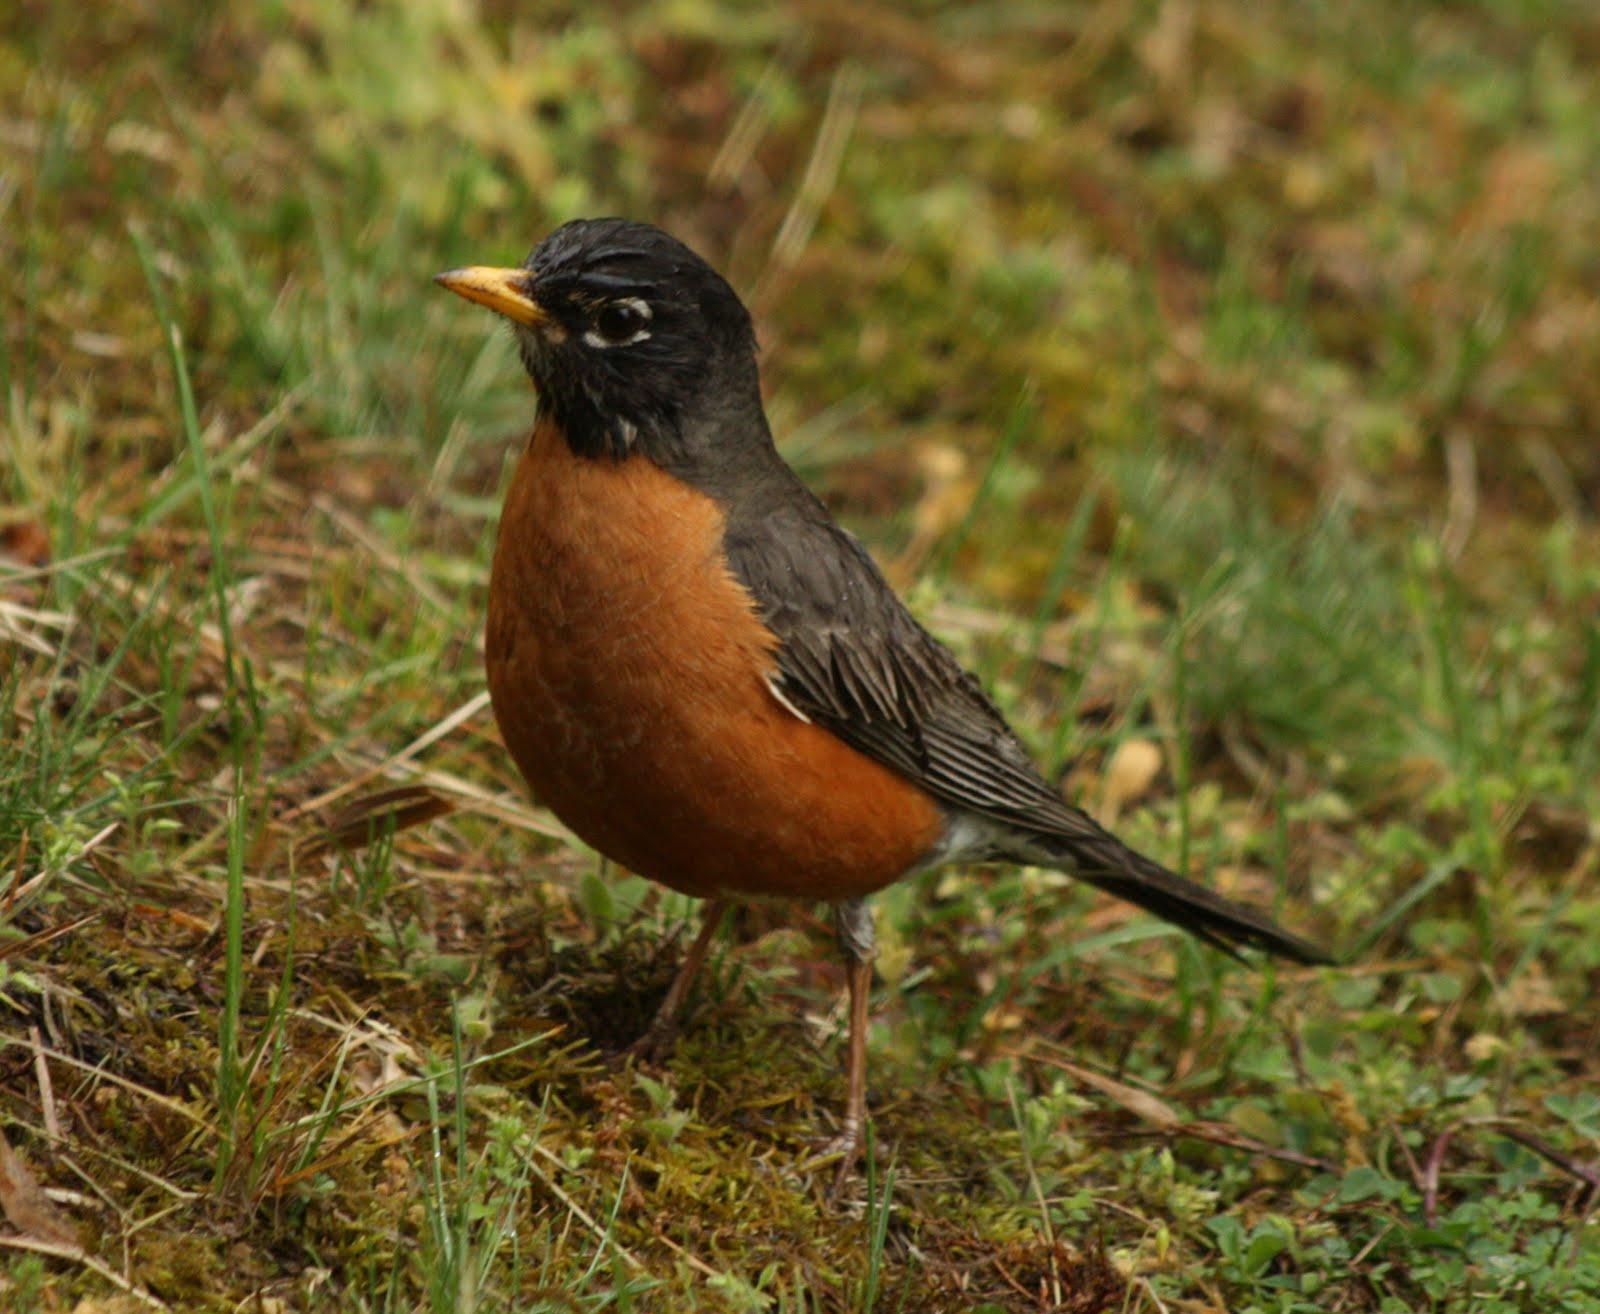 What Food Do Robins Like To Eat